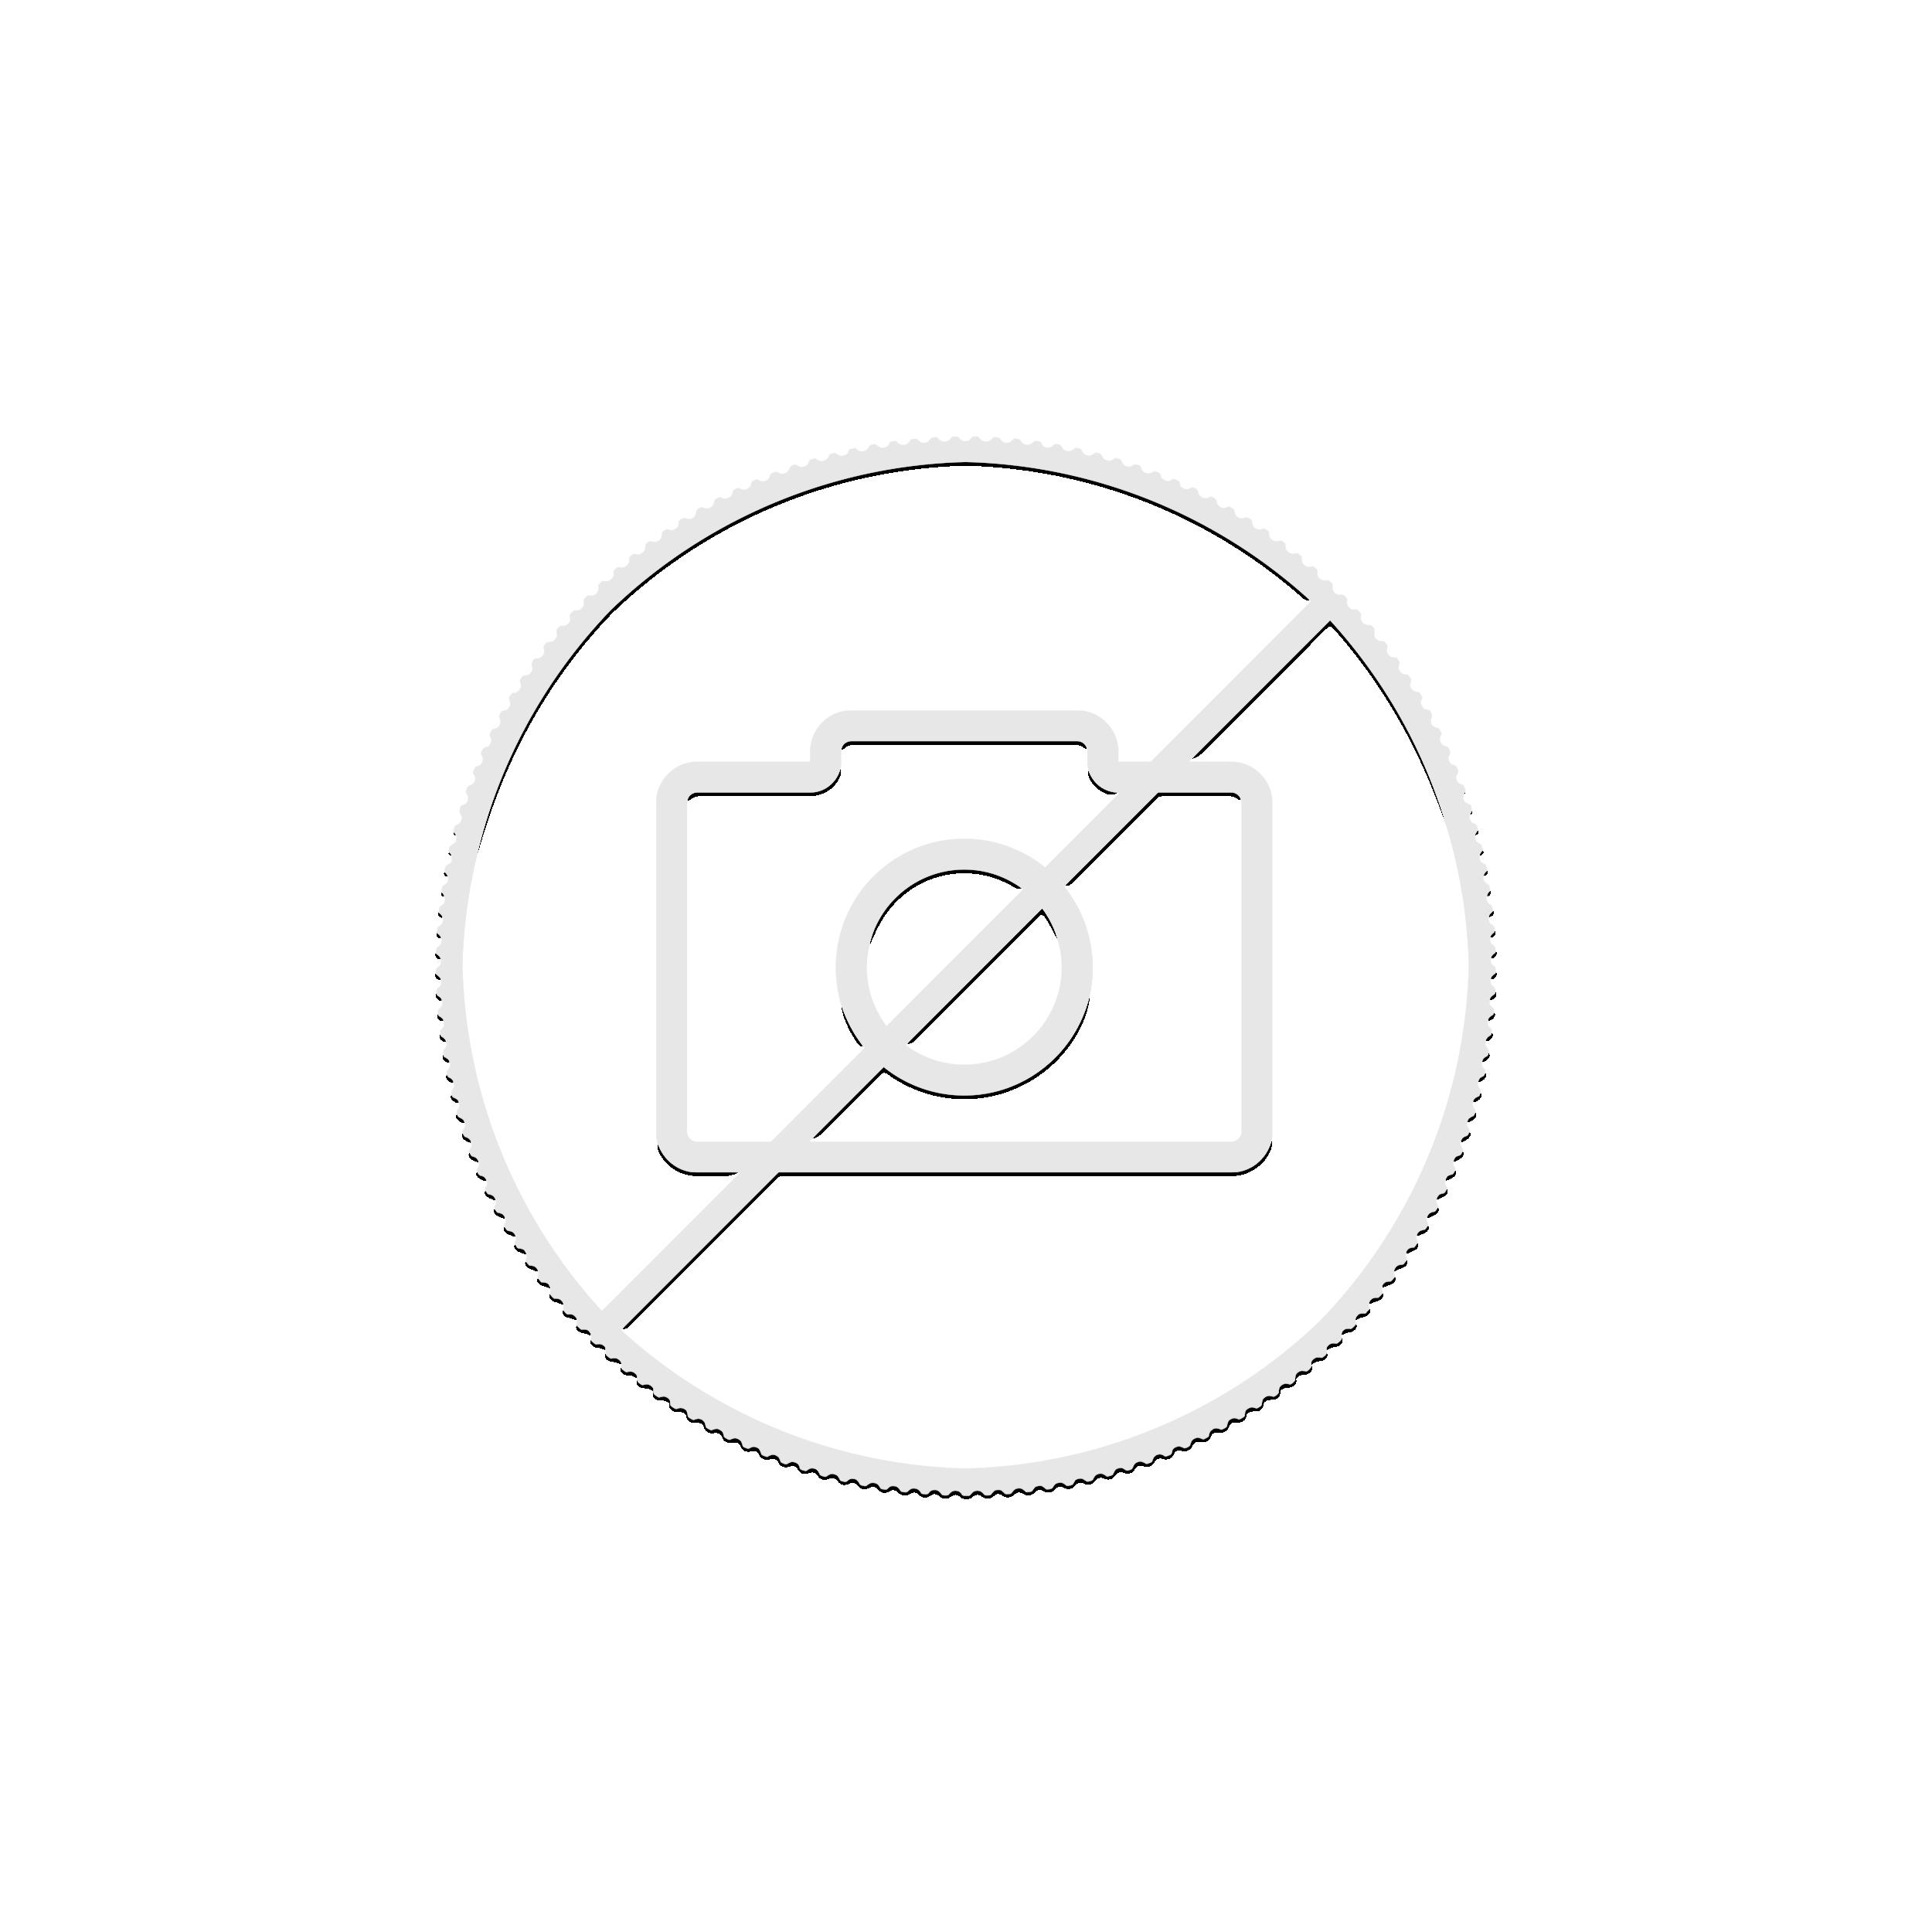 1 Kilo Kookaburra Silver Coin 2016 Buy Gold And Silver Online